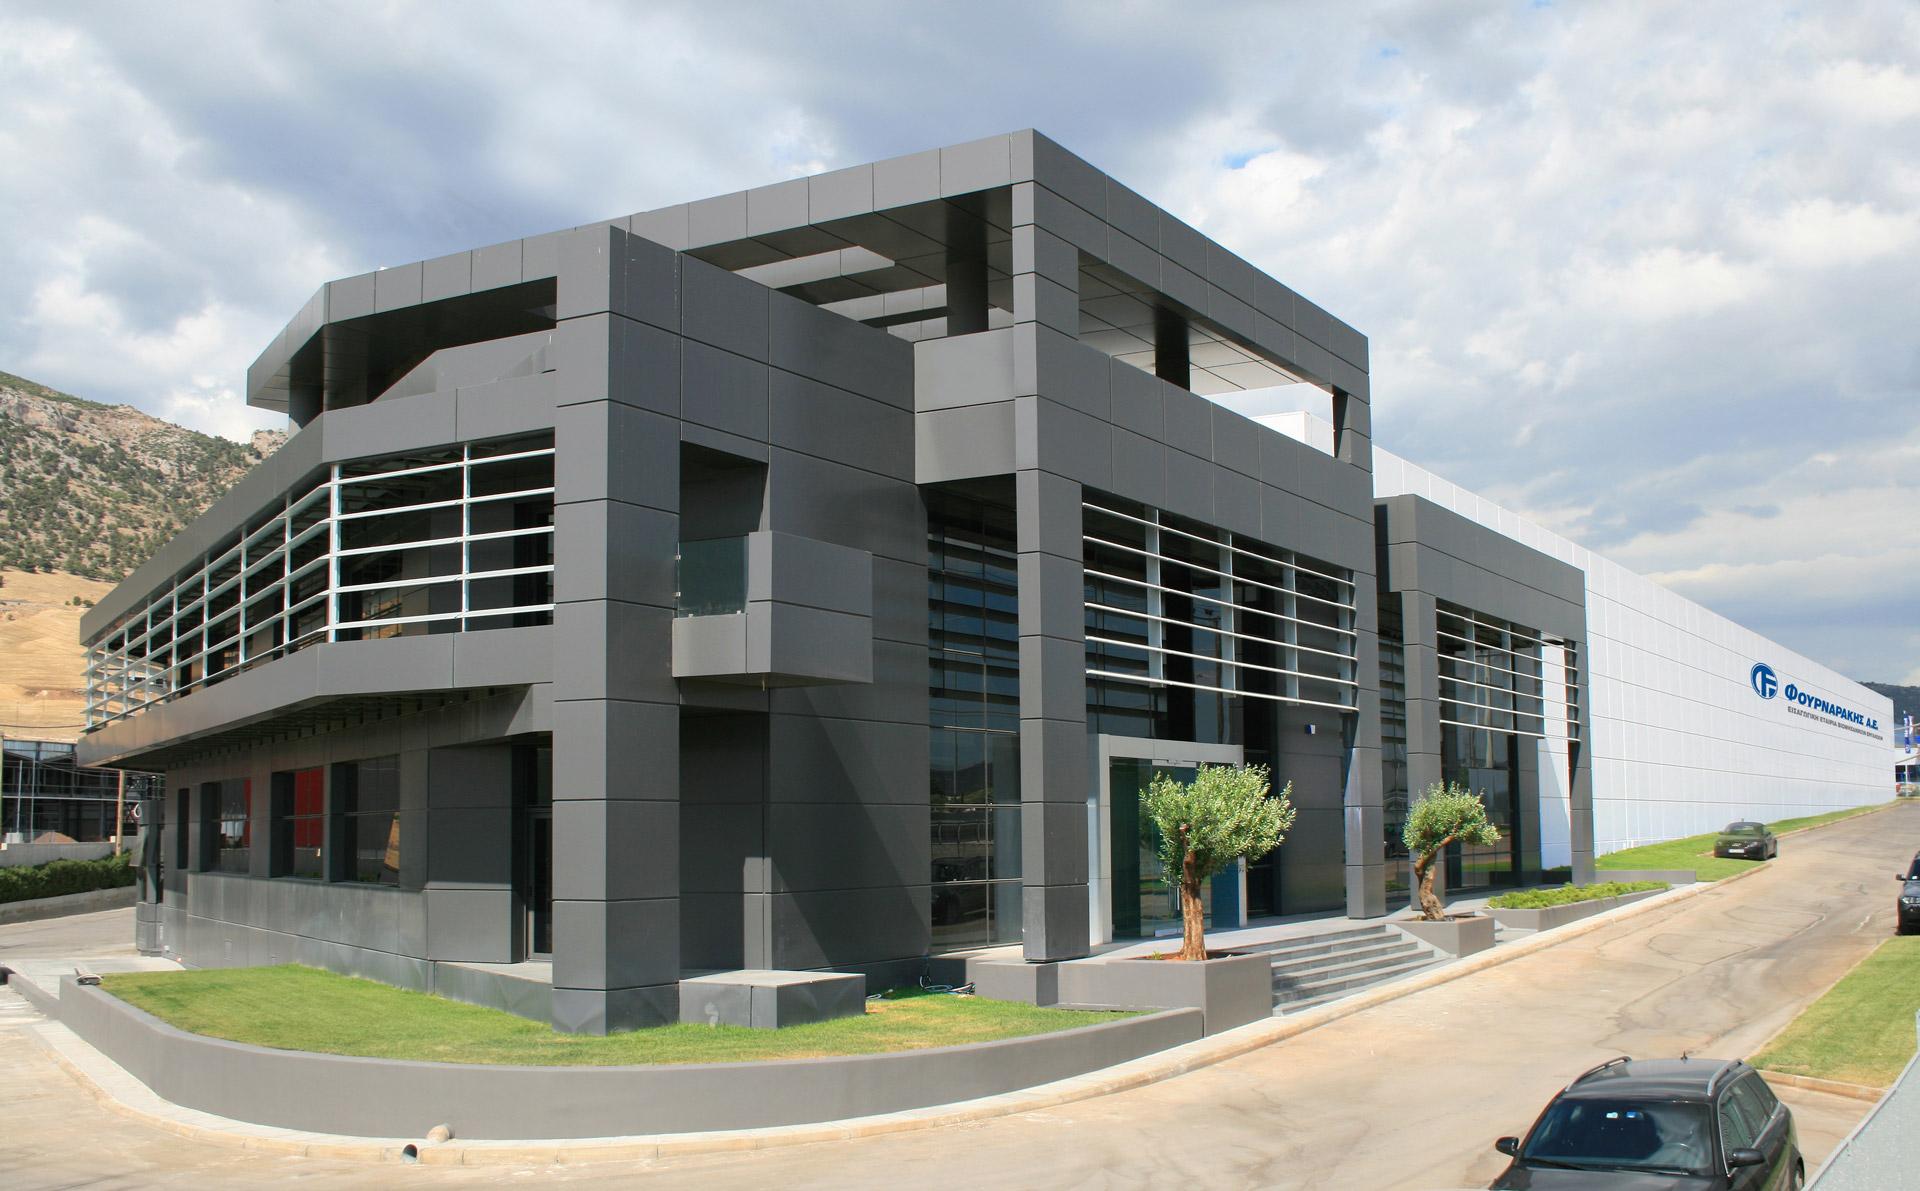 Office Storage Building : Design of an office storage building in aspropirgos